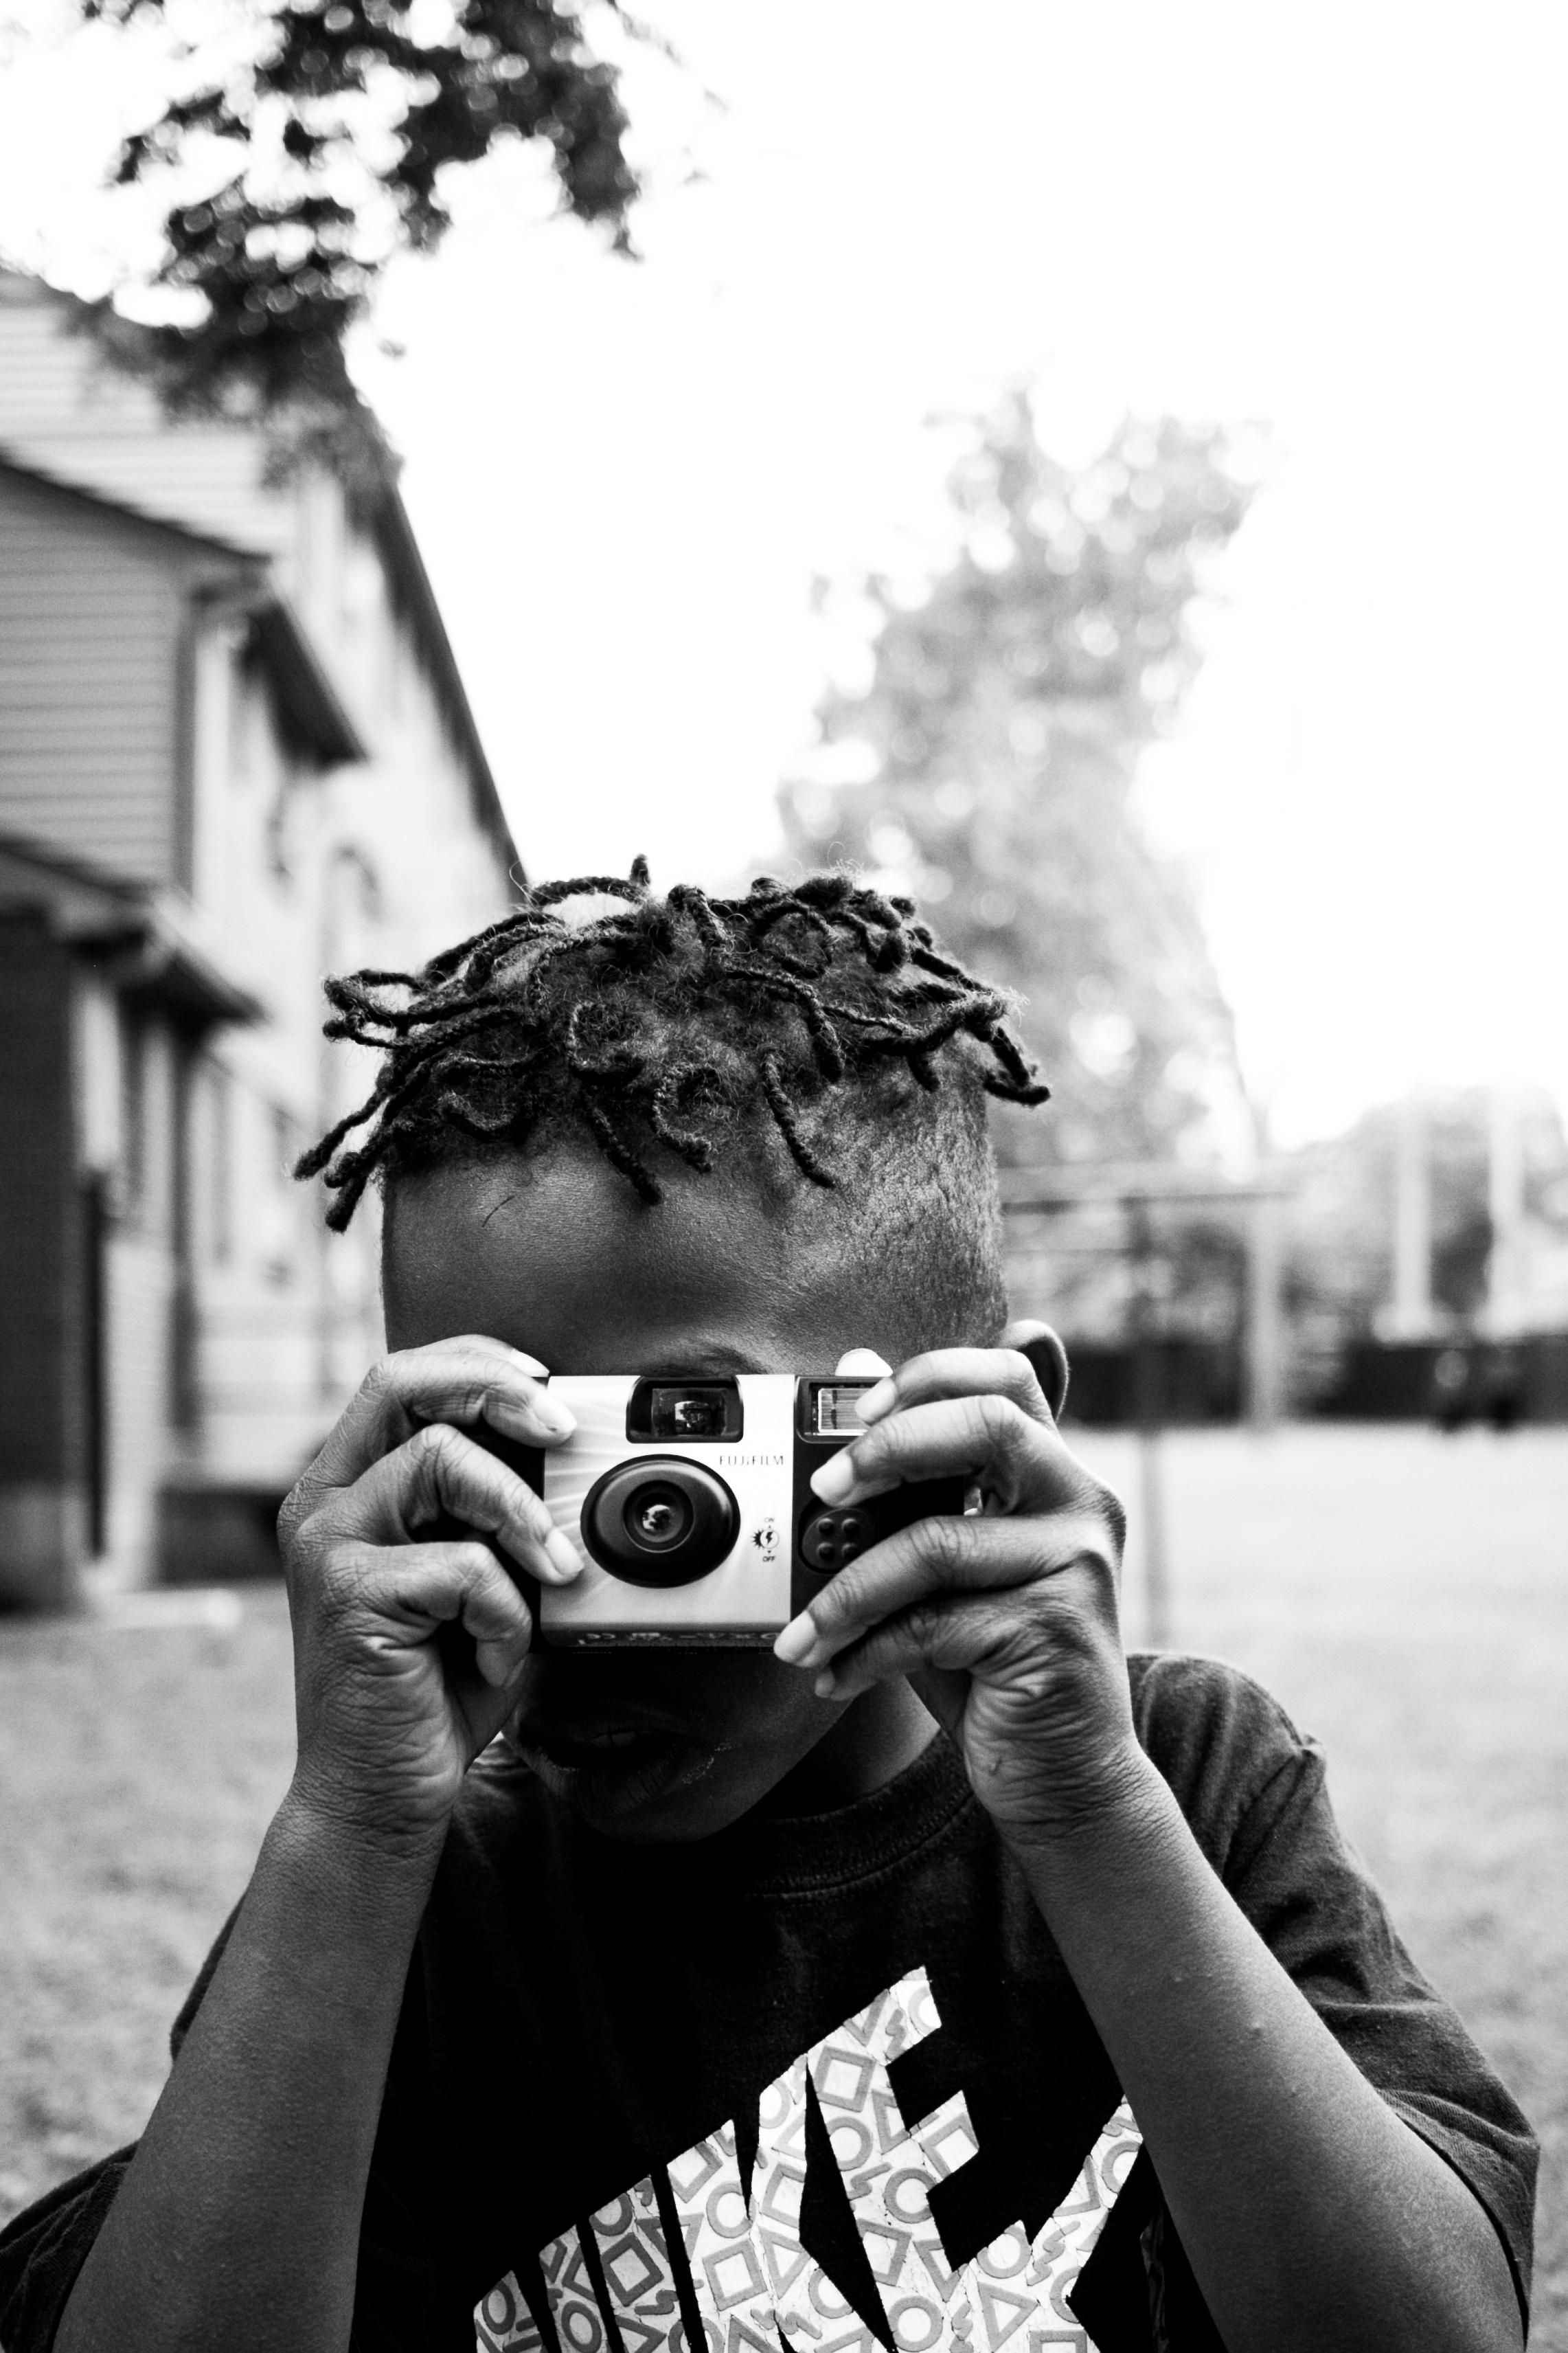 NAPIER-SUDEKUM COMMUNITY IDENTITY PROJECT / PHOTOGRAPHY BY LEXANDER BRYANT / ORGNZD VISUALS